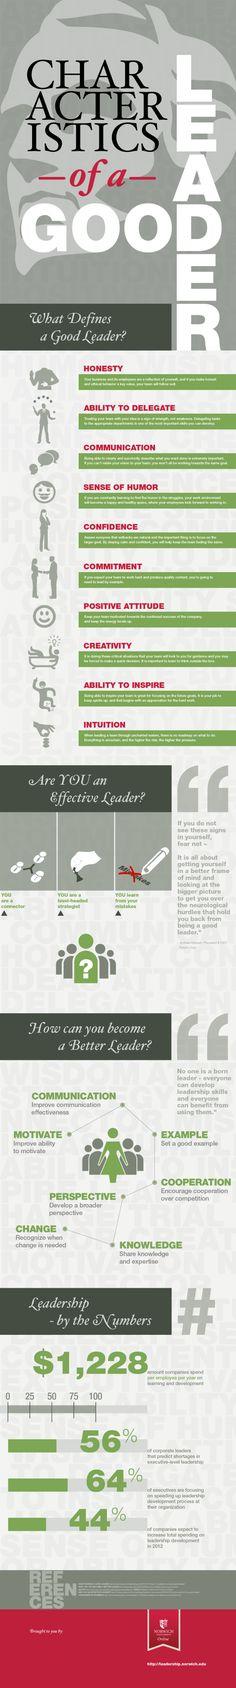 Characteristics of a good leader #infografia #infographic